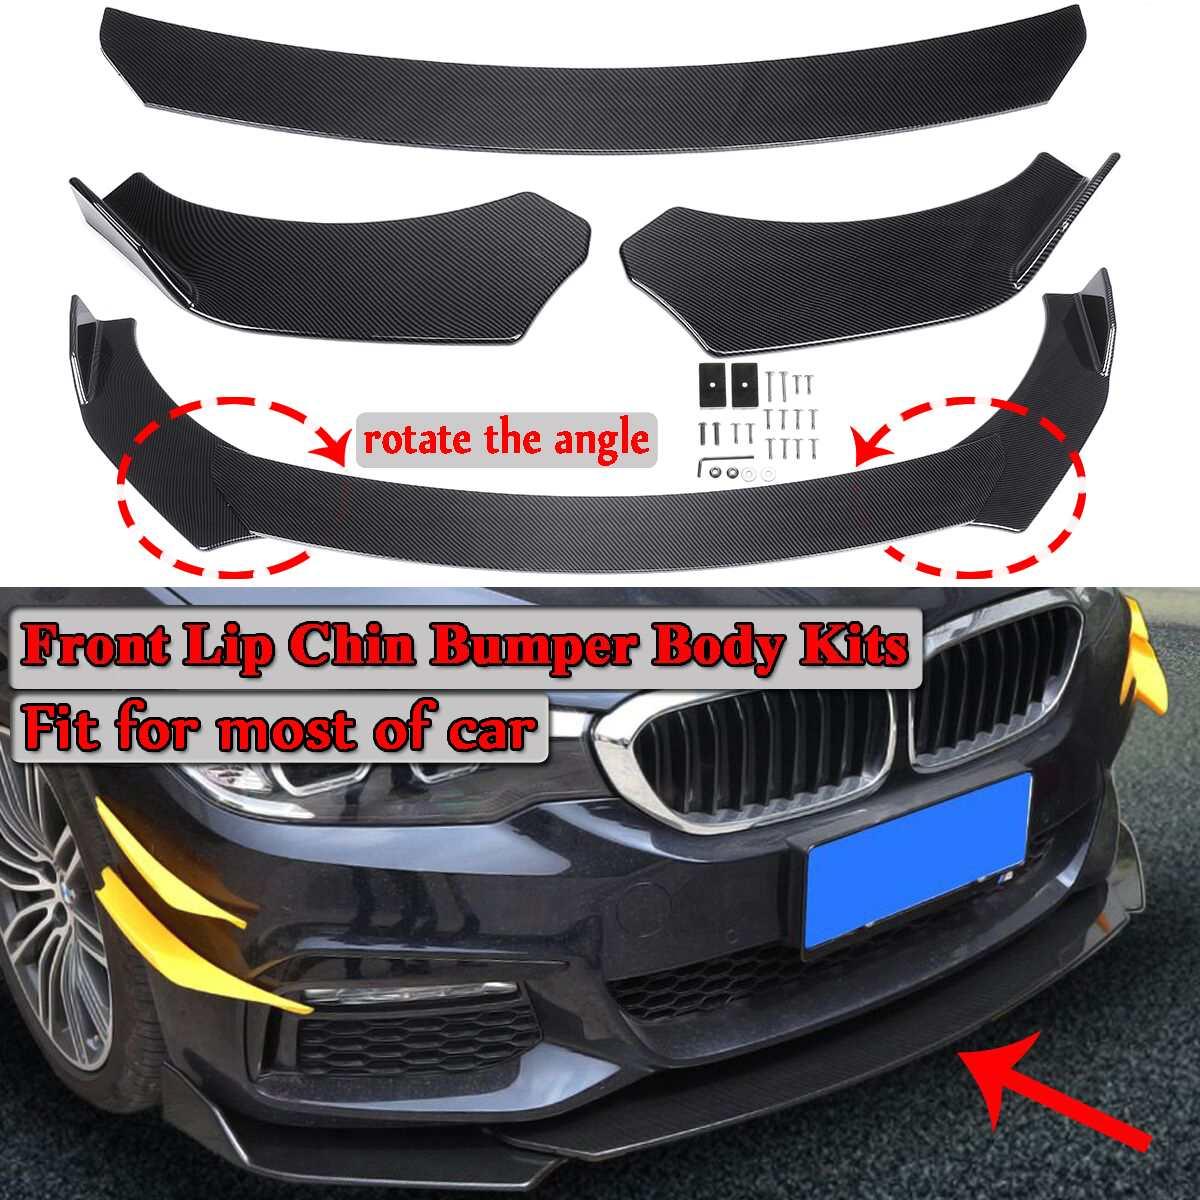 Carbon Fiber Look/ Black Universal Car Front Bumper Lip Chin Bumper Body Kits Splitter Diffuser For BMW For Benz For Audi For VW